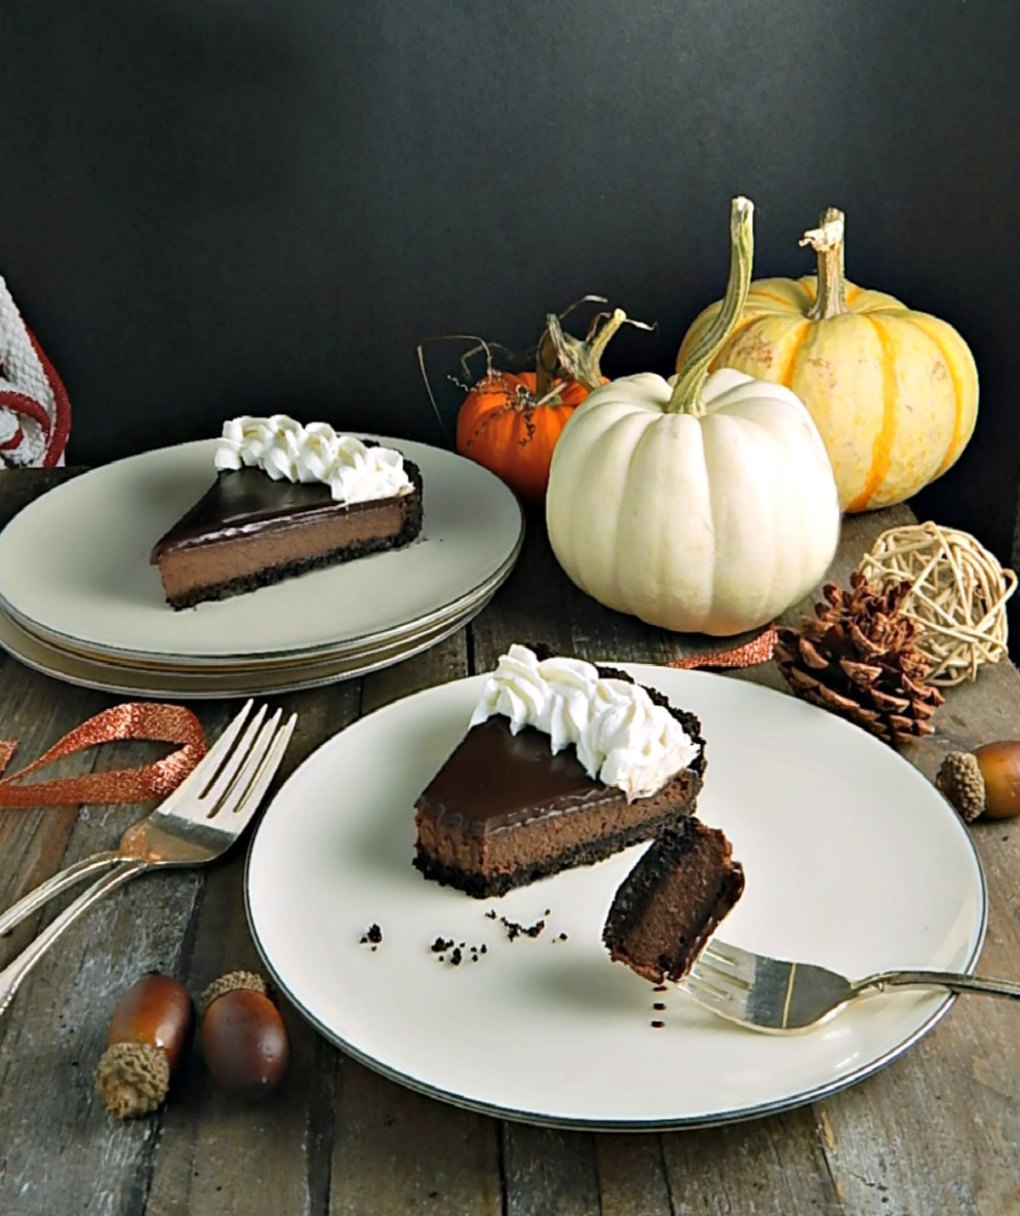 Chocolate Glazed Tart